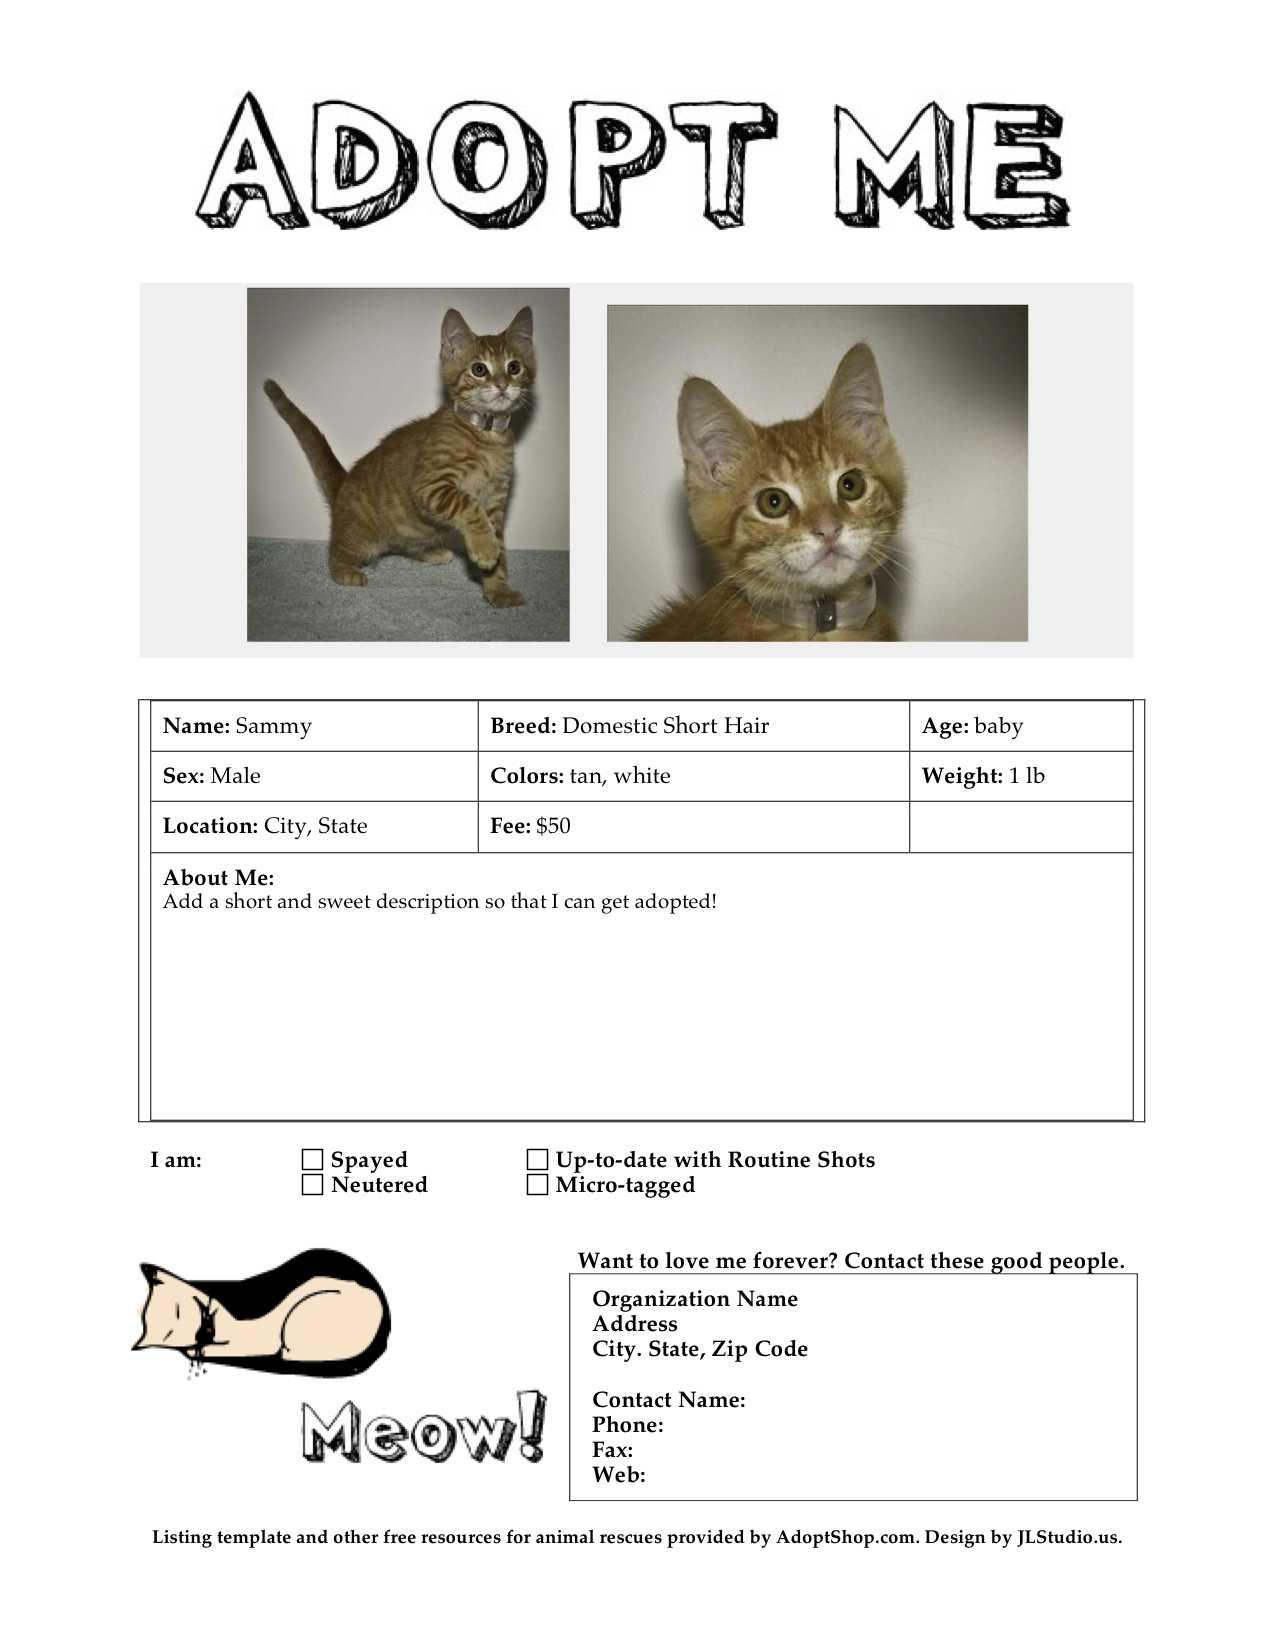 Adoption Listing Templates   Throughout Dog Adoption Flyer Template